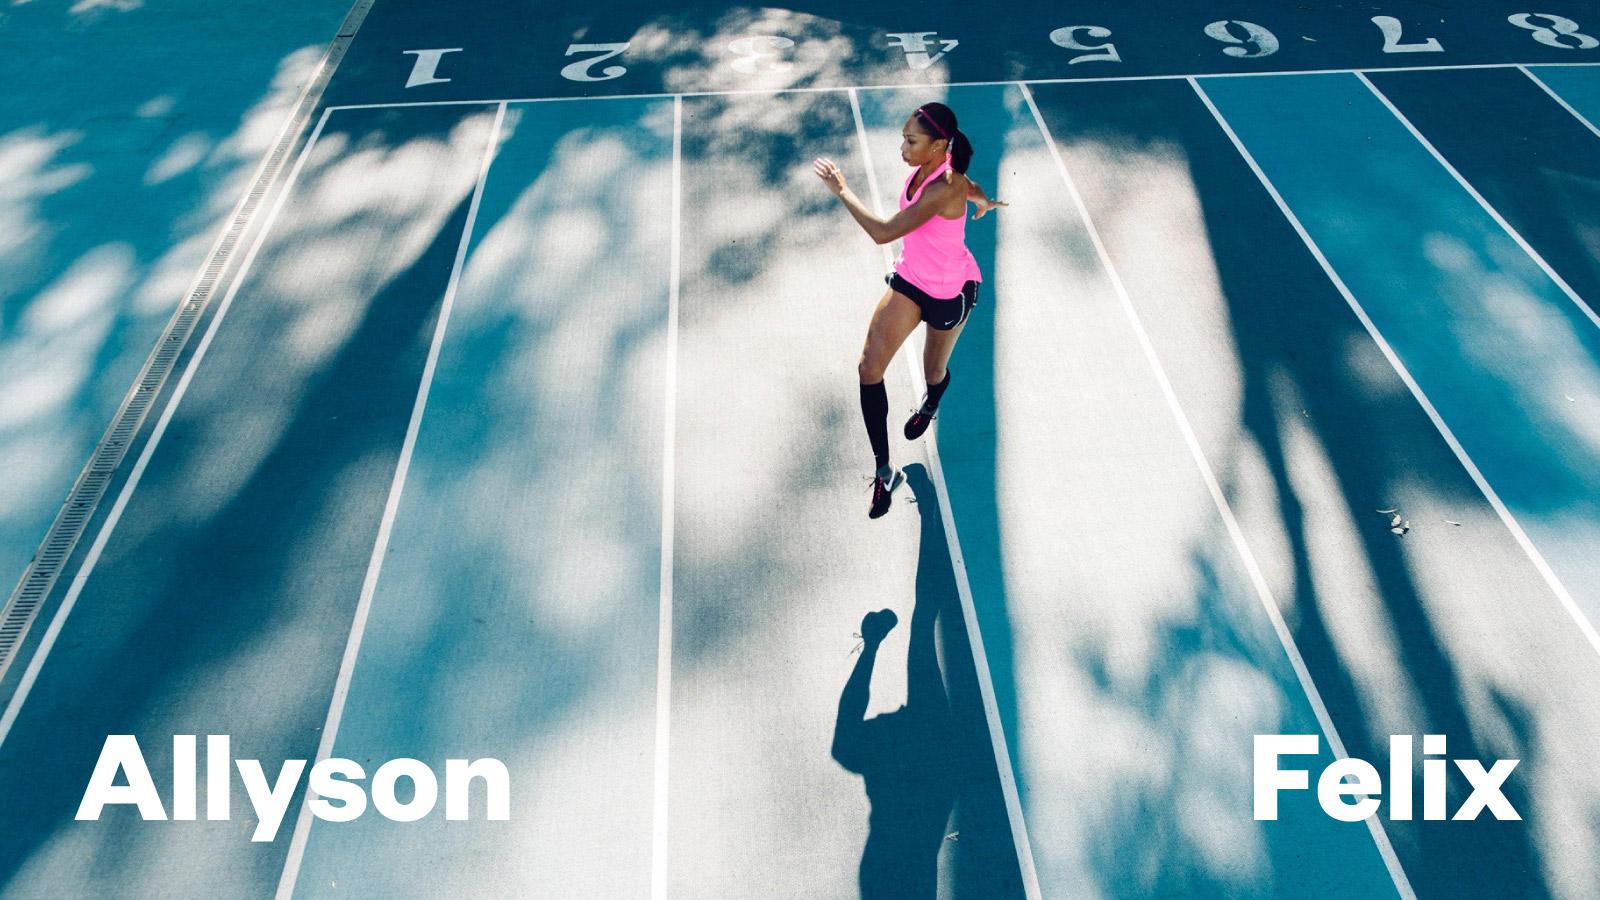 Nike news os hub teasers allysonfelix hd 1600